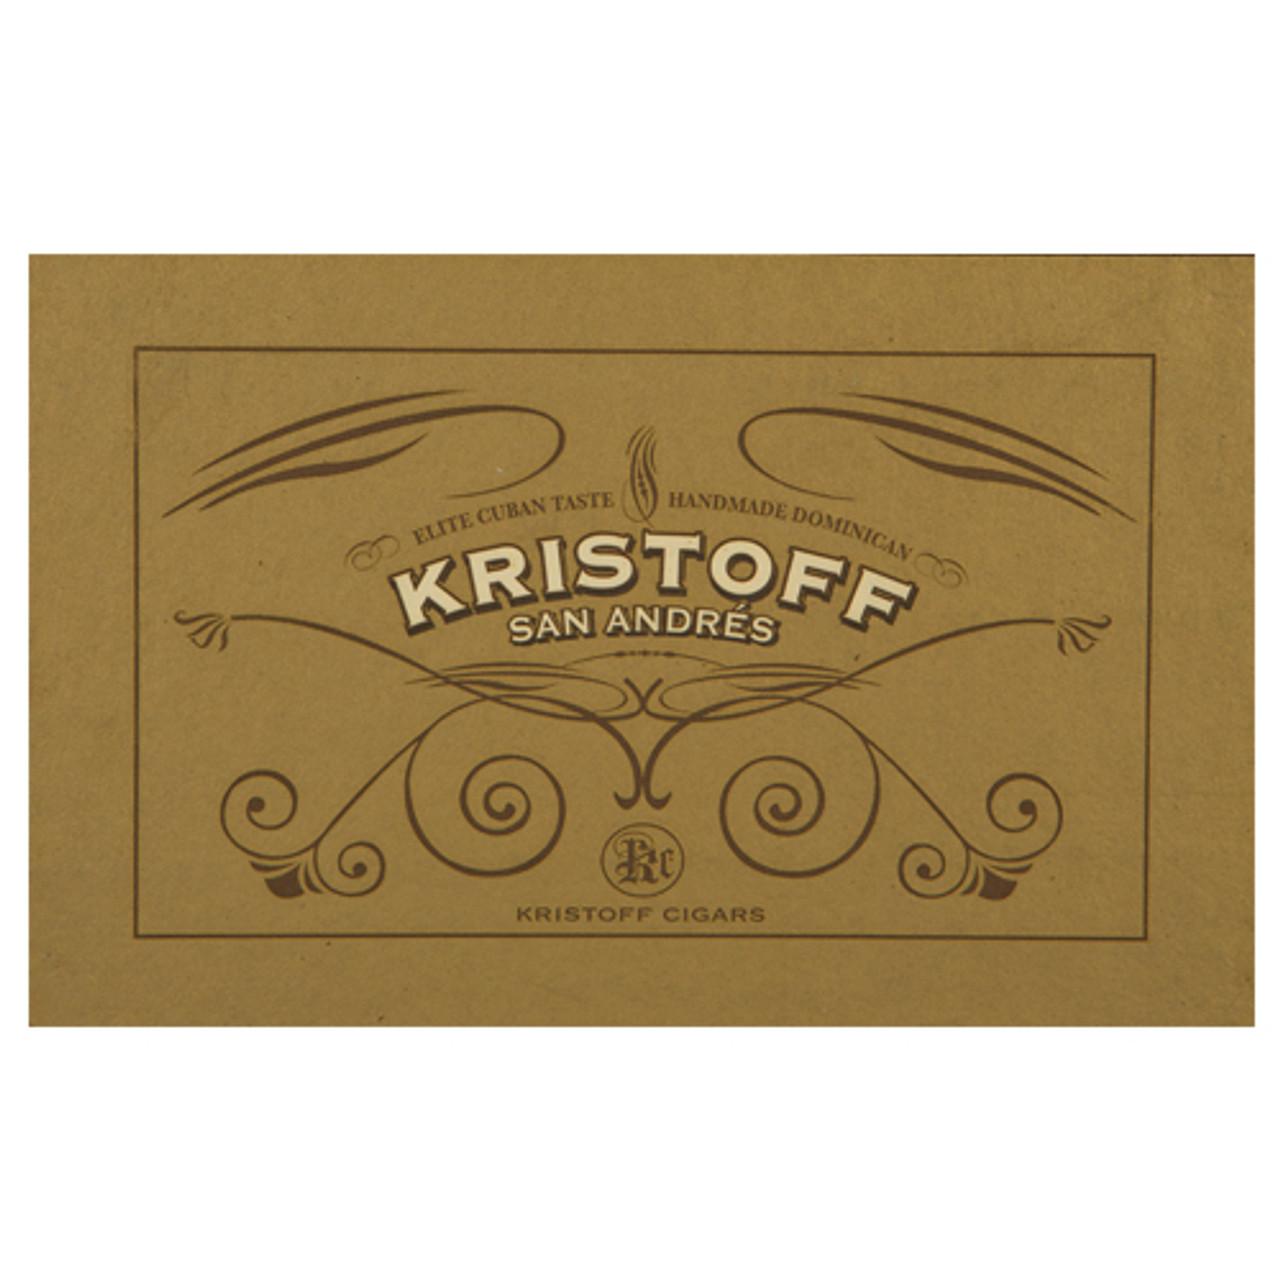 Kristoff San Andres Churchill Cigars - 7 x 50 (Box of 20)